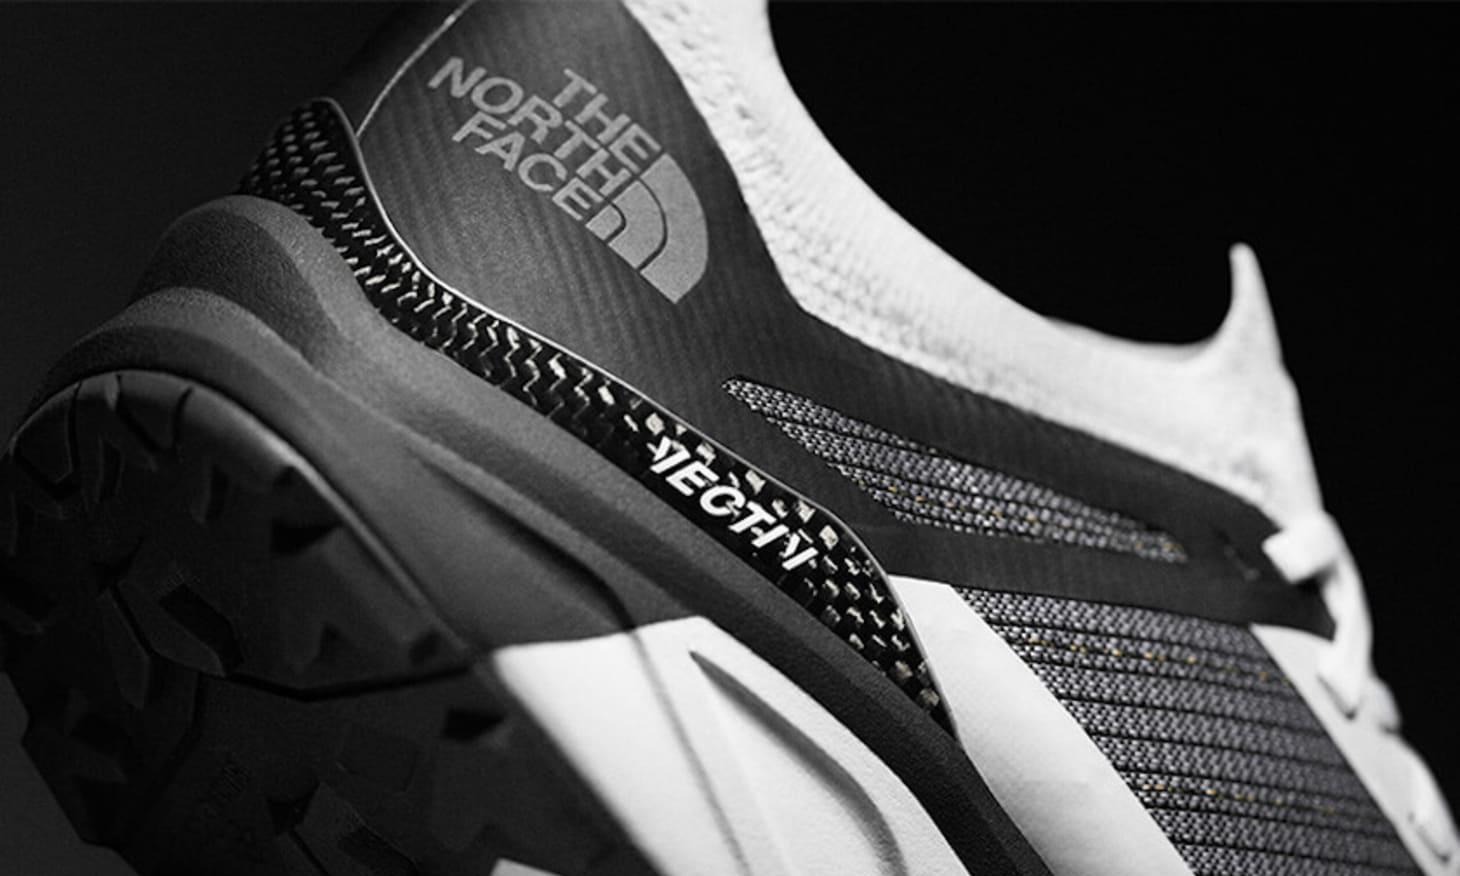 THE NORTH FACE 发布 3D 碳板跑鞋「Flight VECTIV」